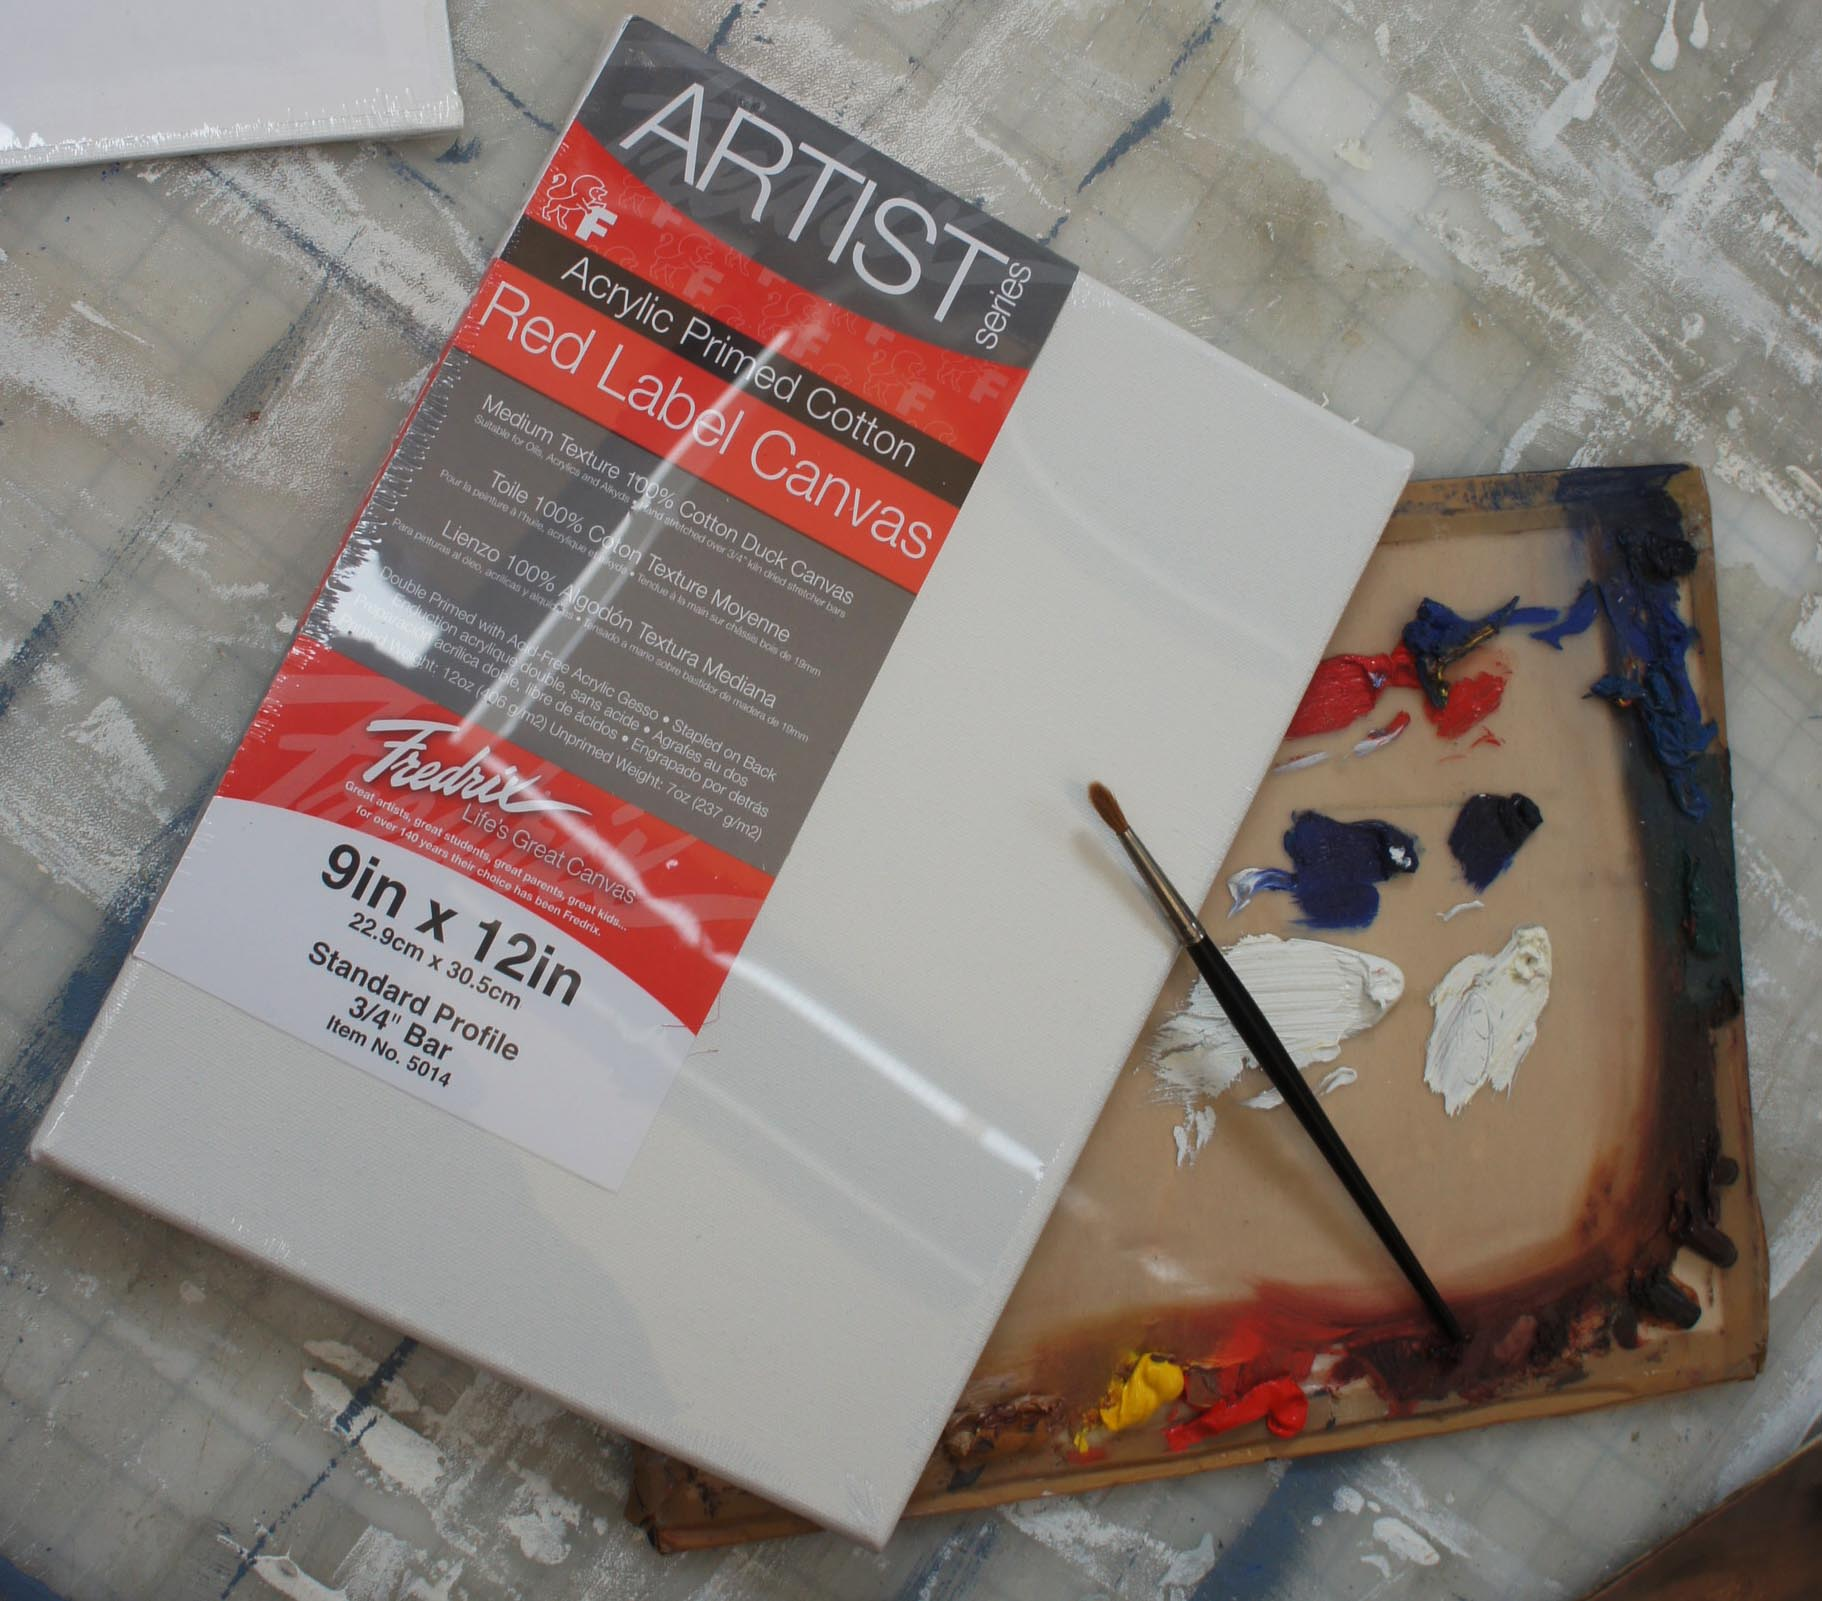 Canvas Fredrix – London Art Shop : Buy Art Supplies